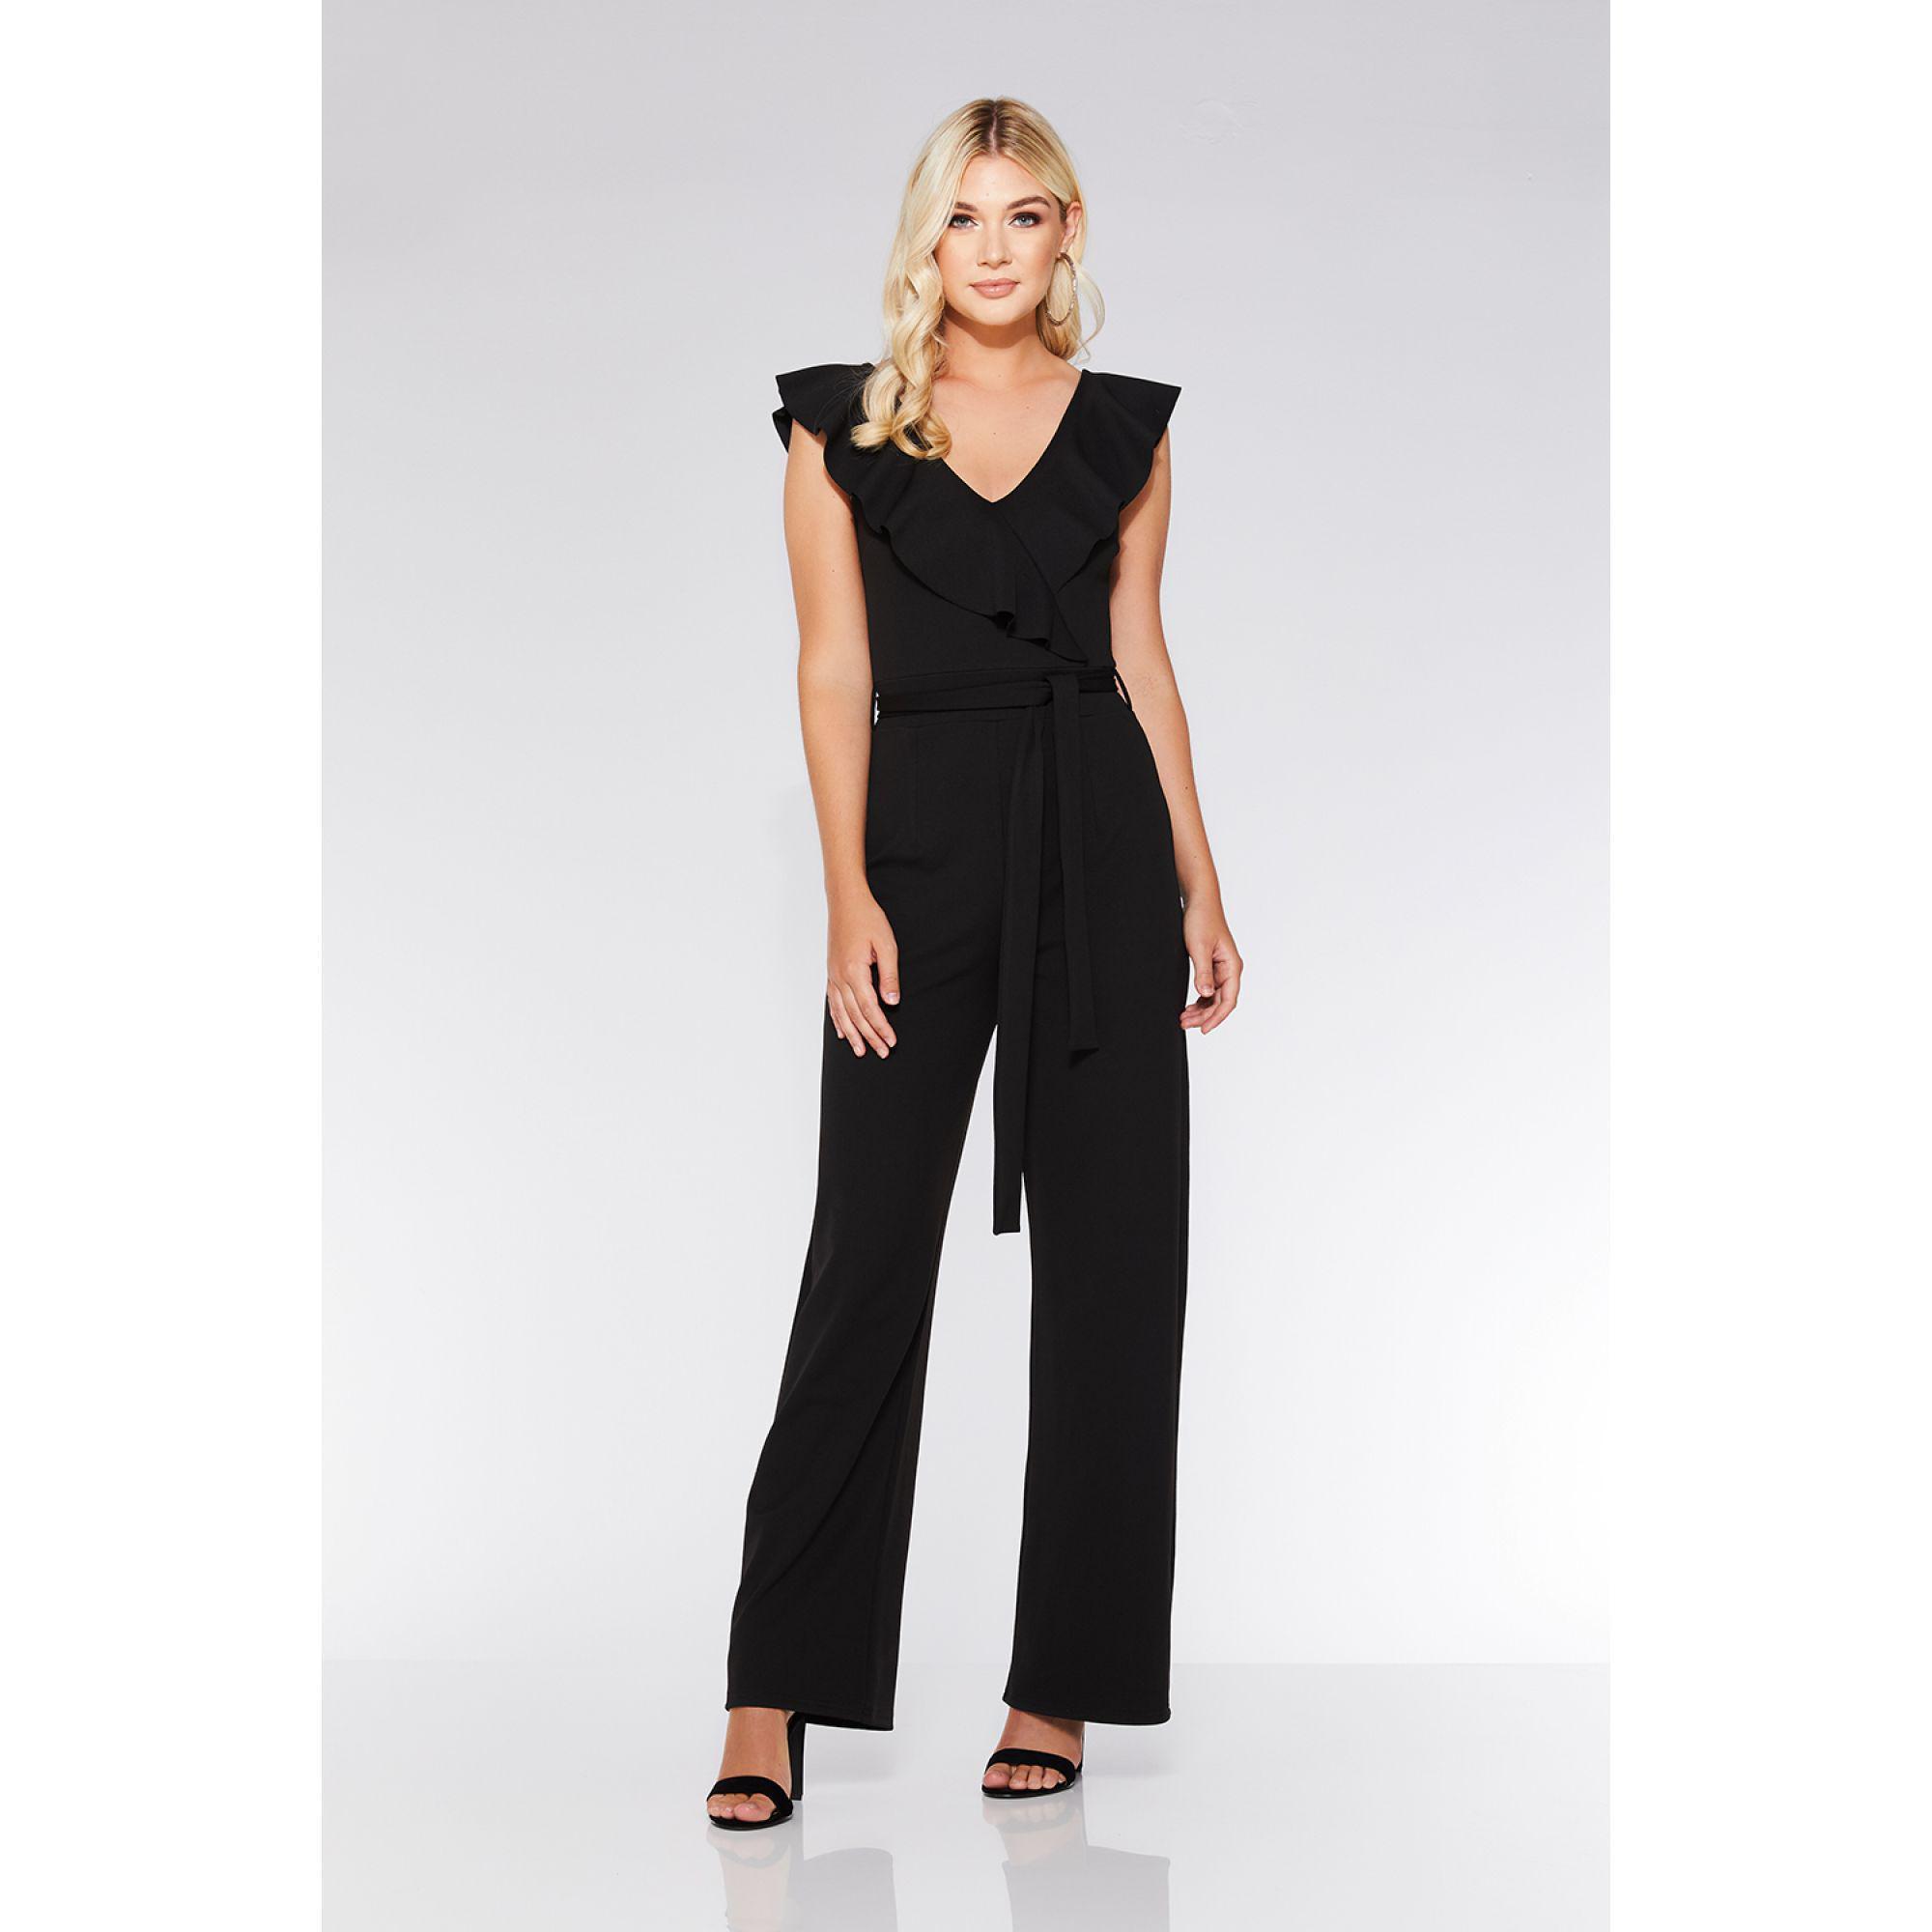 0544119c6df Quiz Black Frill Tie Belt Palazzo Jumpsuit in Black - Lyst